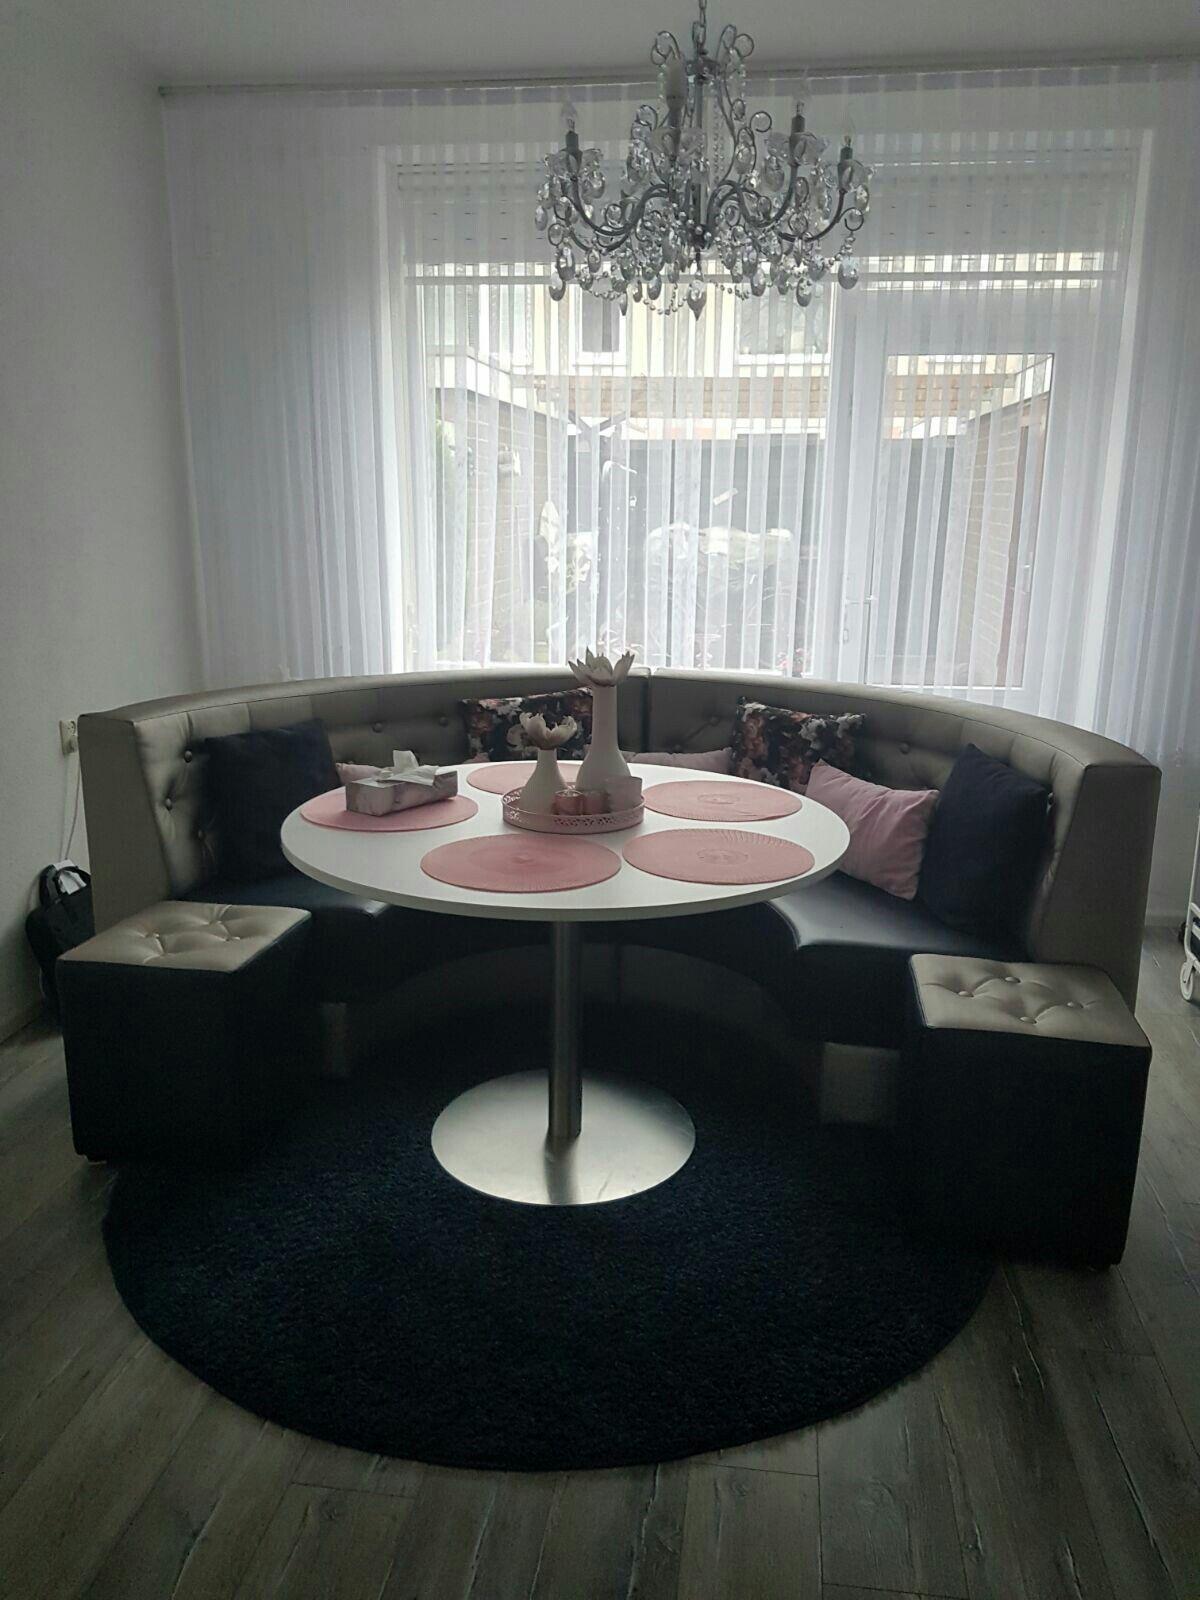 Eetkamerbank Eettafel bank Ronde Eet bank Eetkamer meubels ...